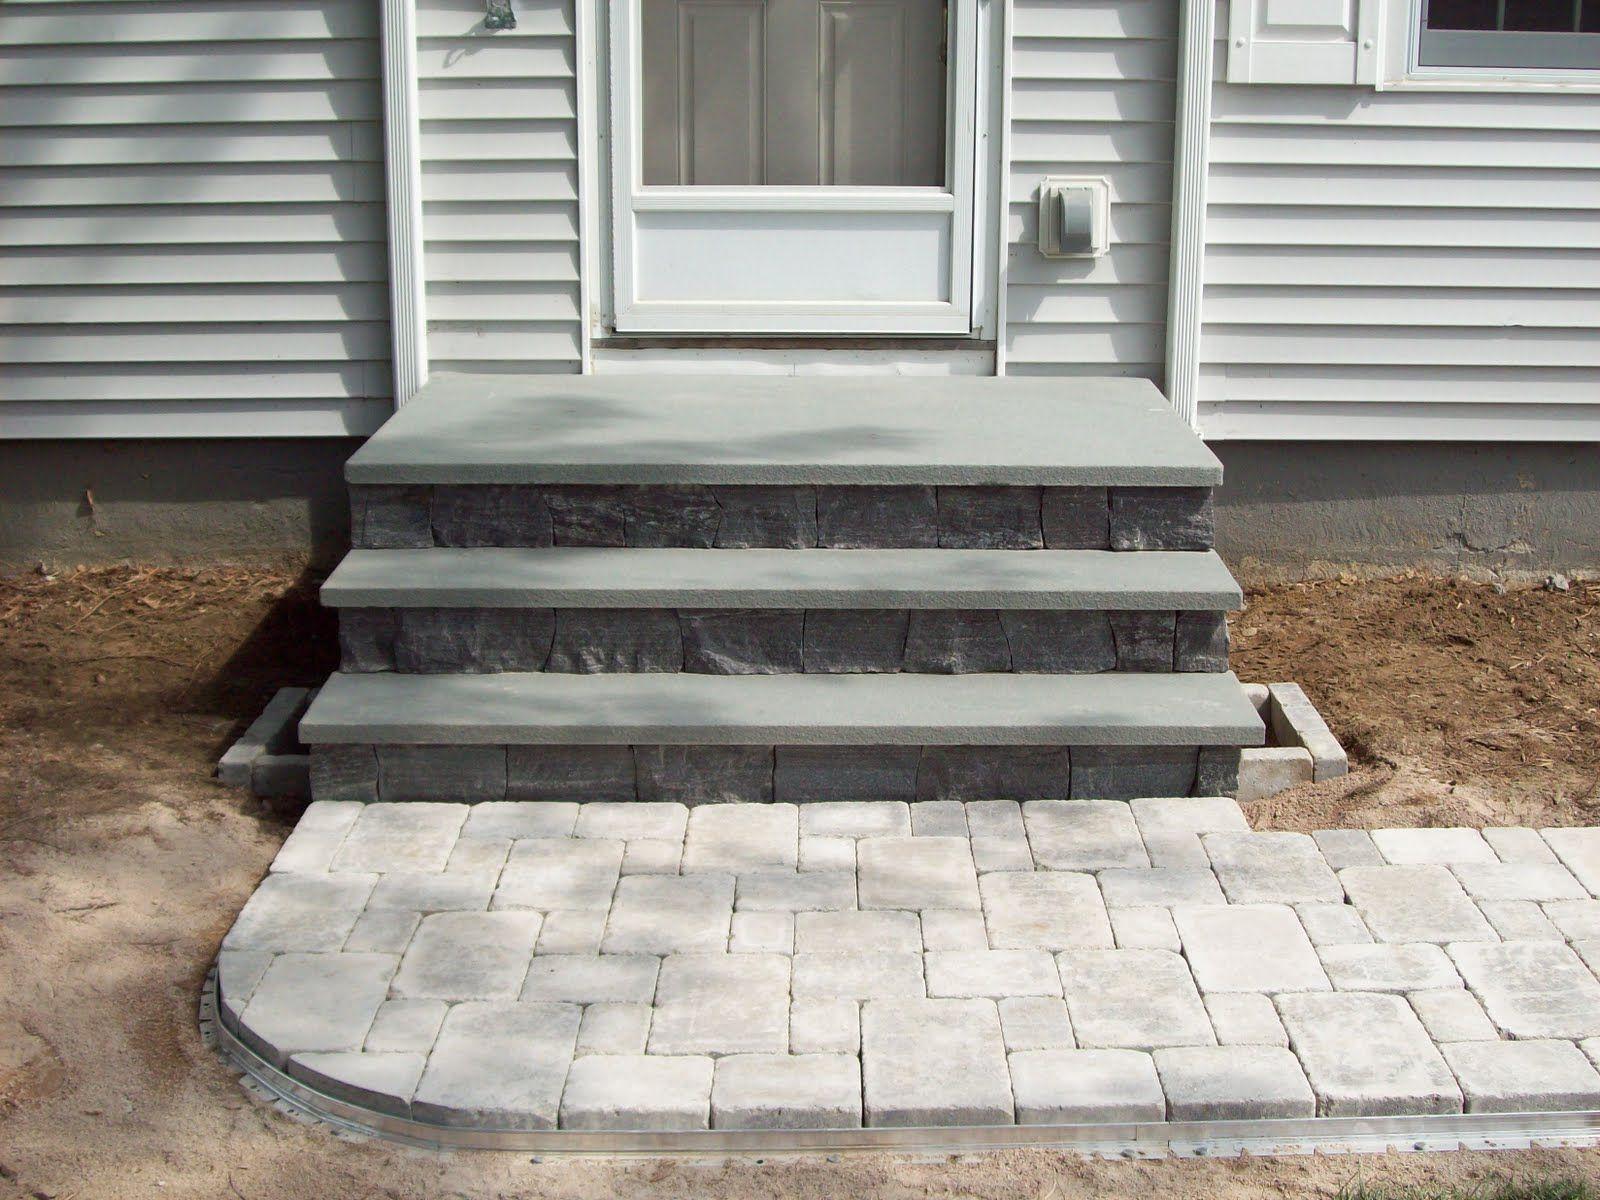 Cement Front Porch Sinking • Porches Ideas on Concrete Back Porch Ideas id=90807